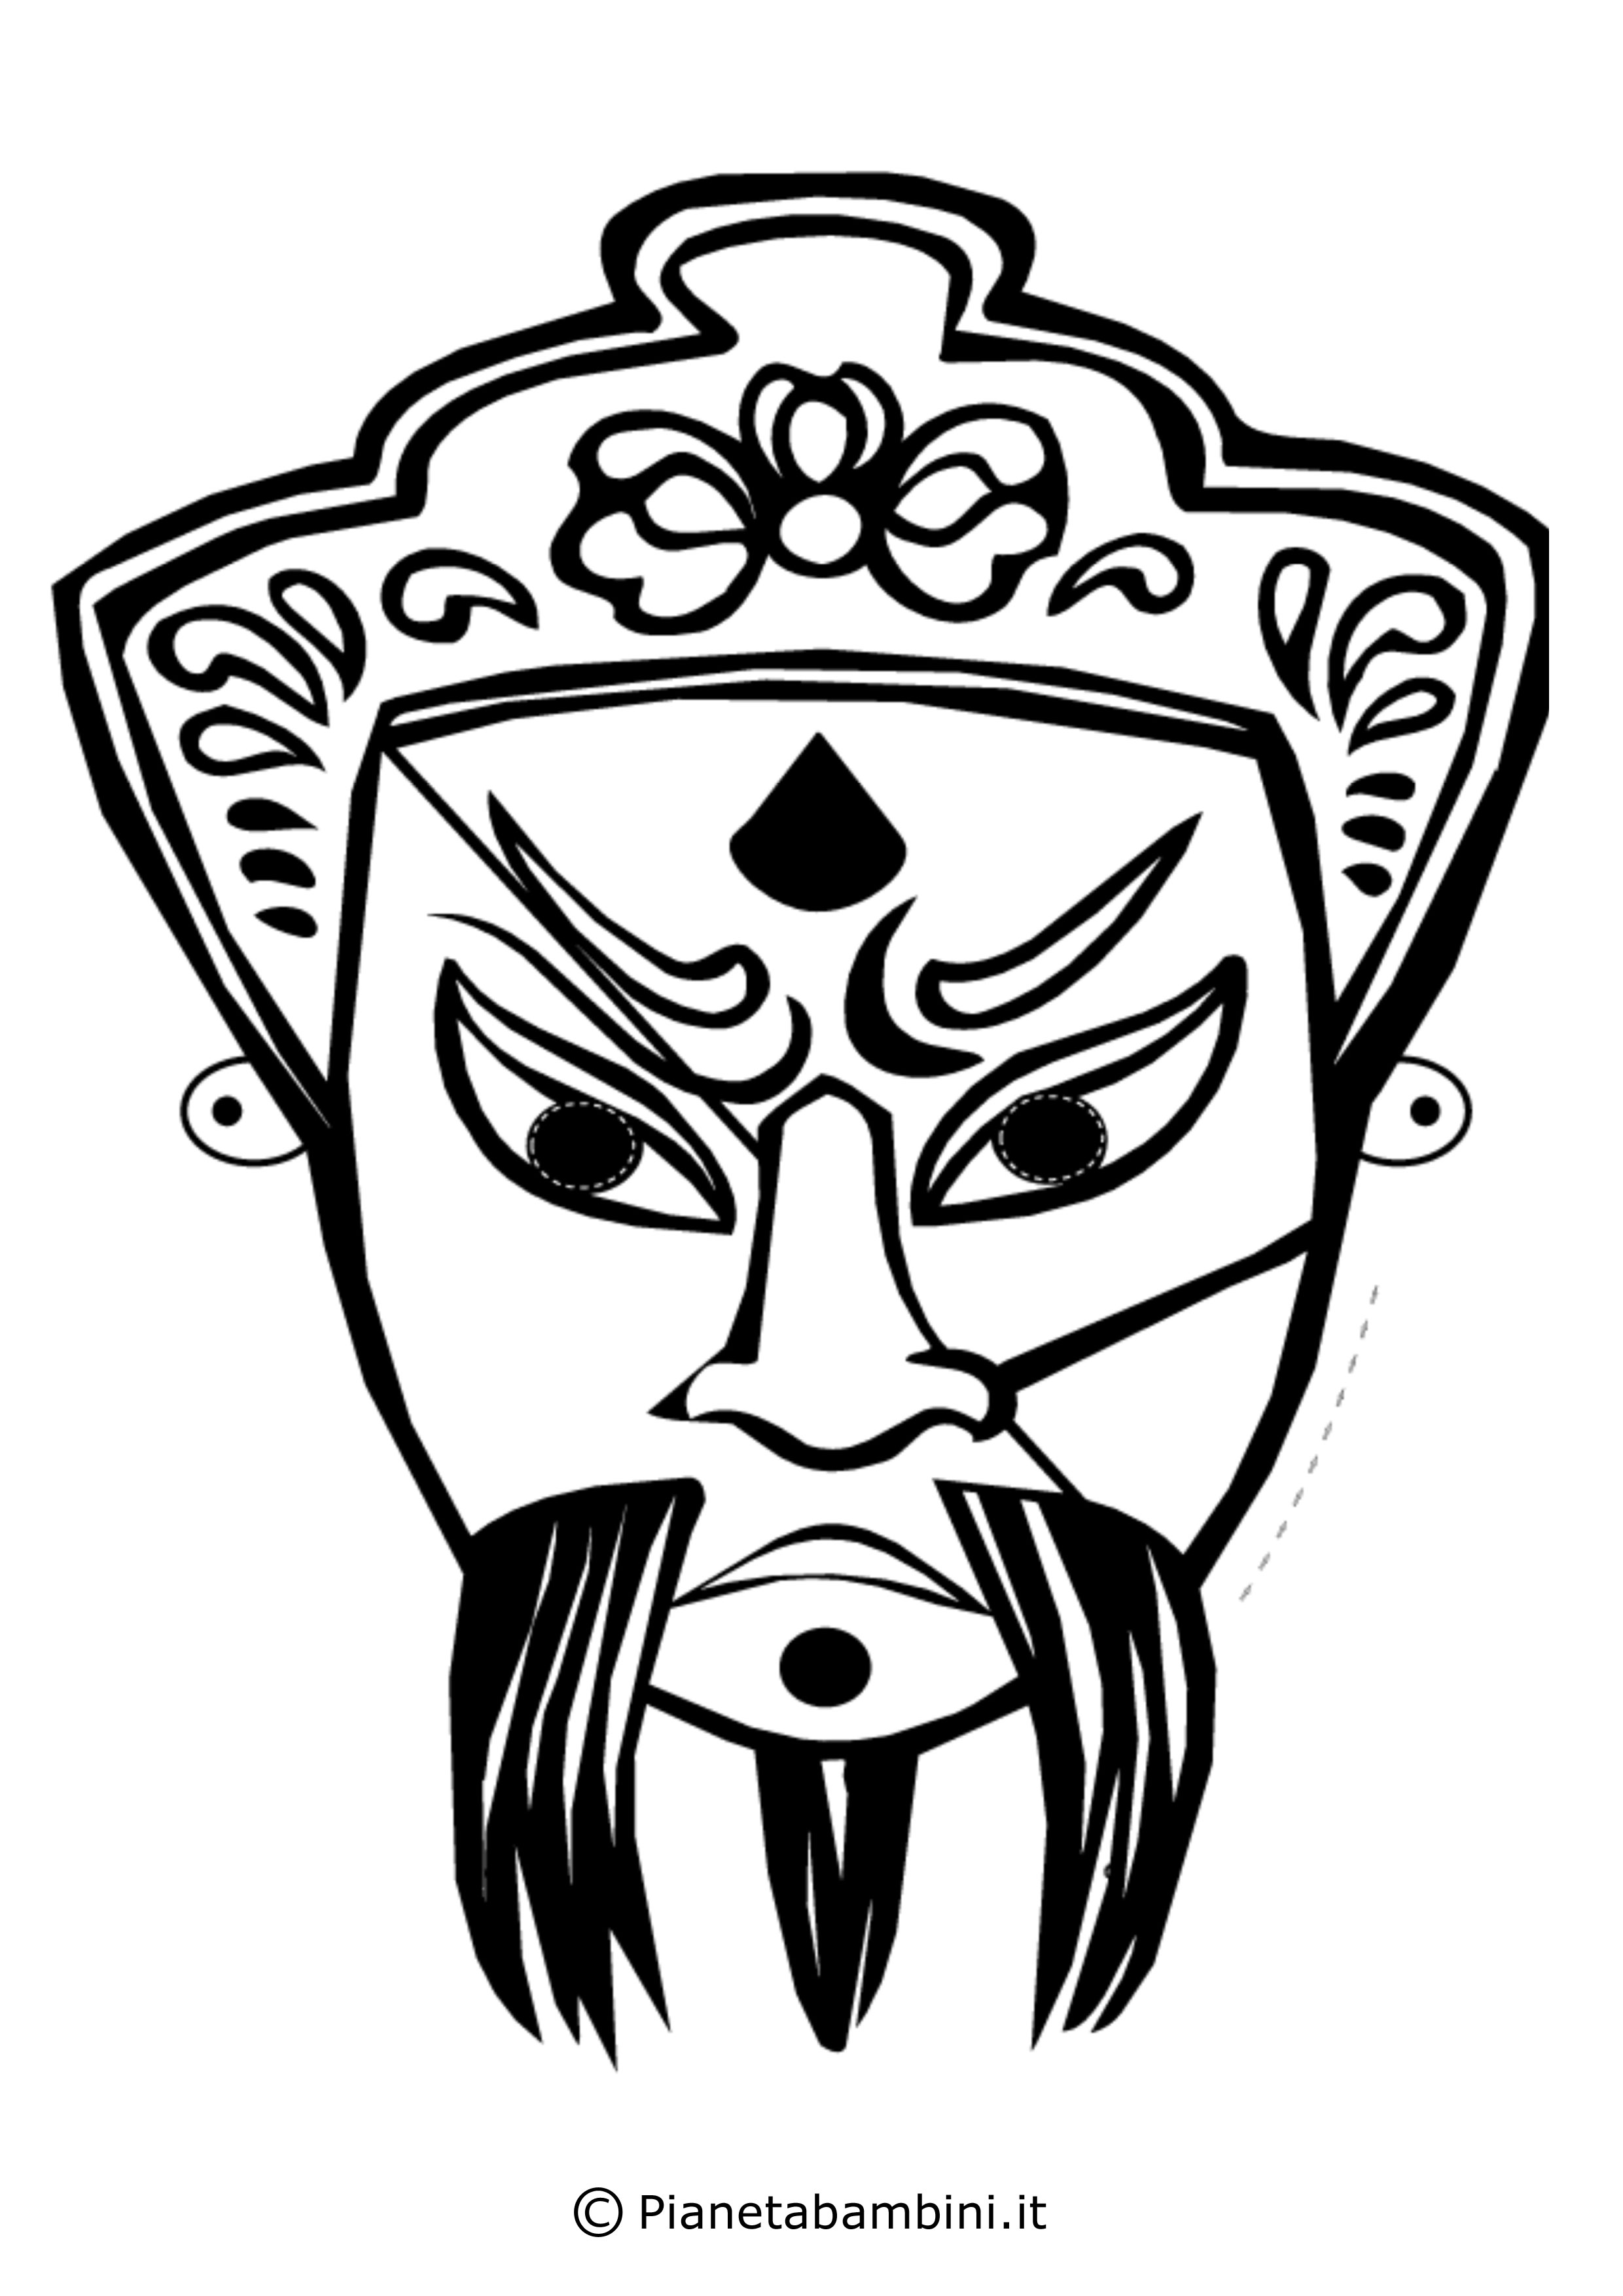 Maschera-Colorare-Cinese-3